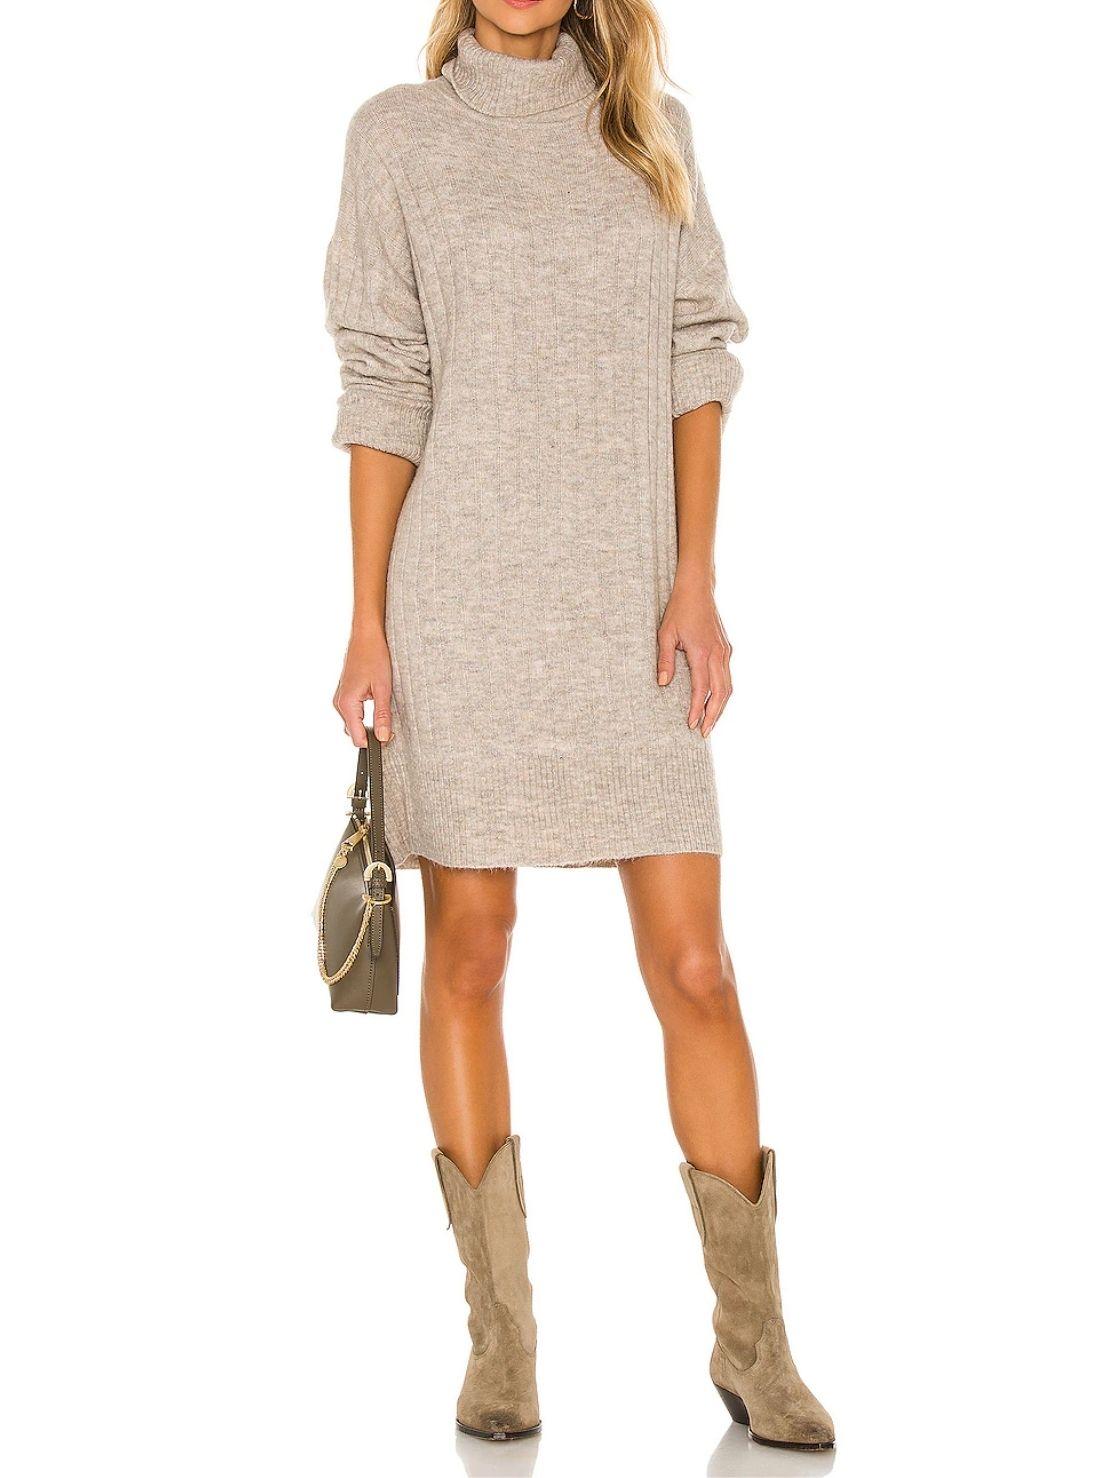 High Collar Wholesale Sweater Dresses